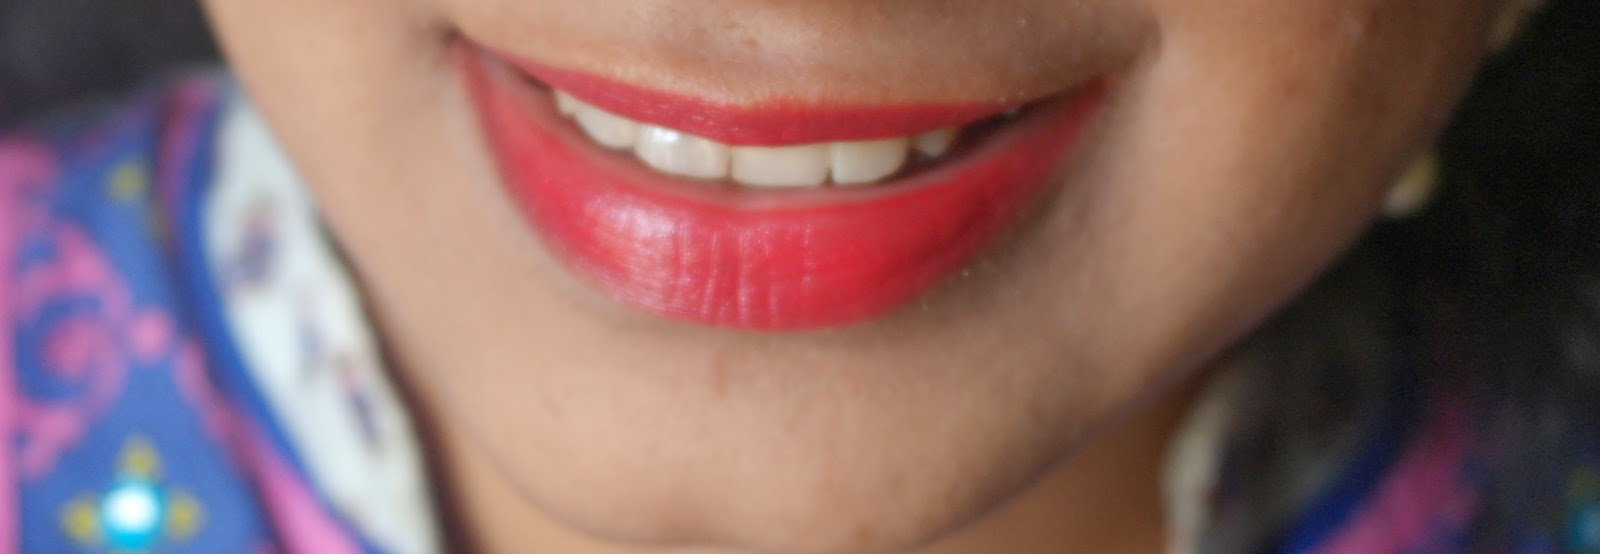 Revlon super lustrous lipstick pigmentation-staying power